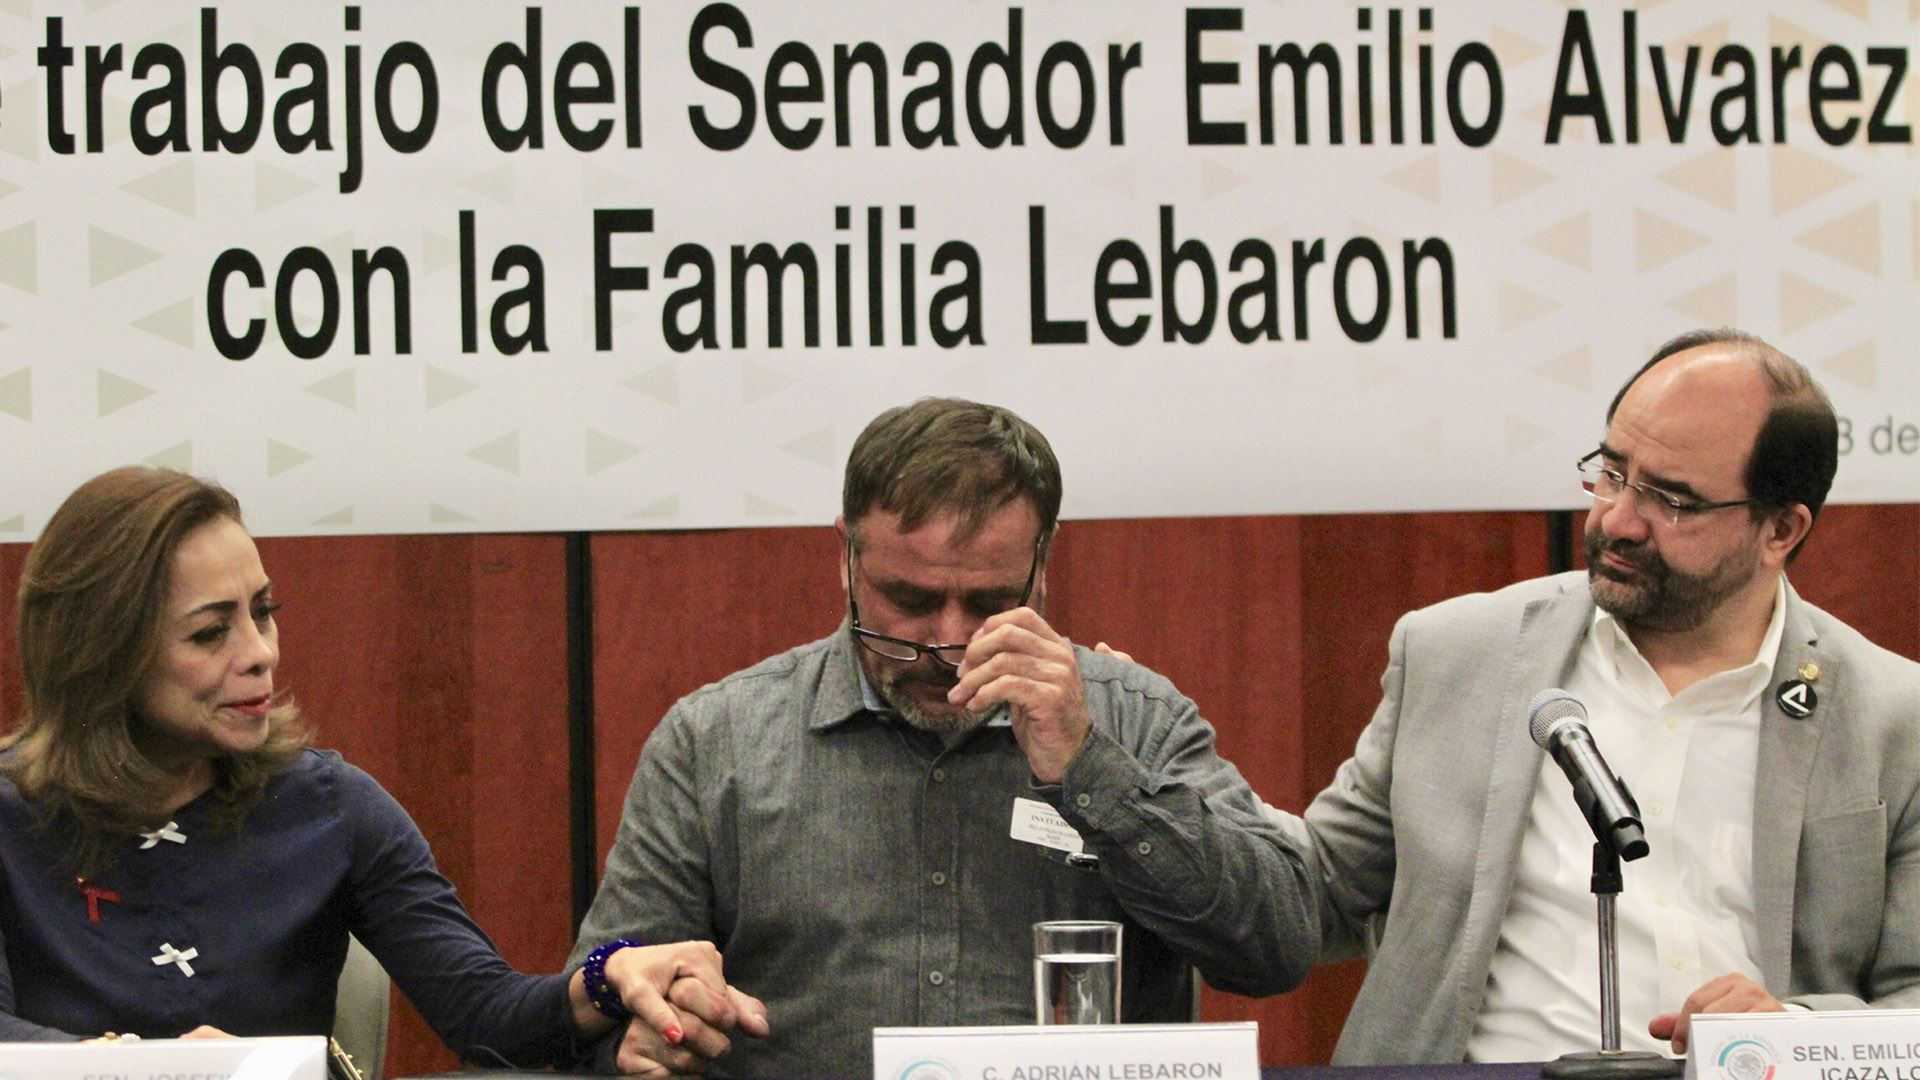 Reunión de familia LeBarón con senadores. Foto de Notimex